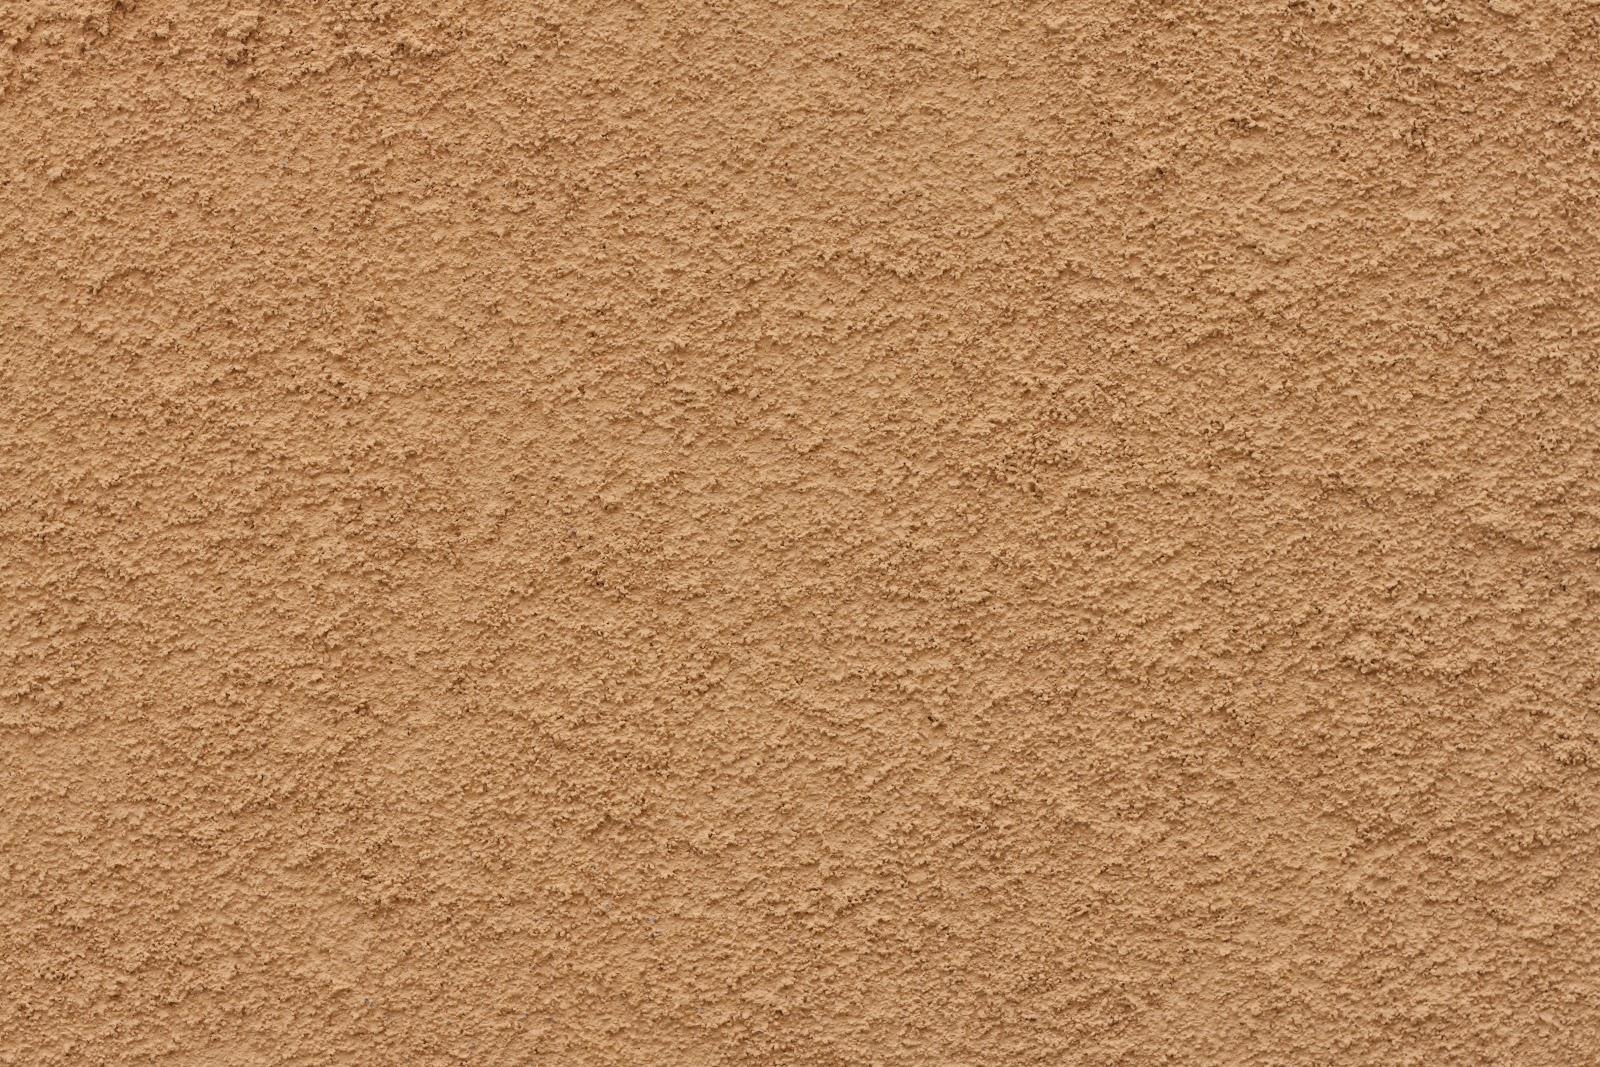 Buy 3d Faux Rock Stone Wallpaper High Resolution Seamless Textures Sharp Orange Wall Texture